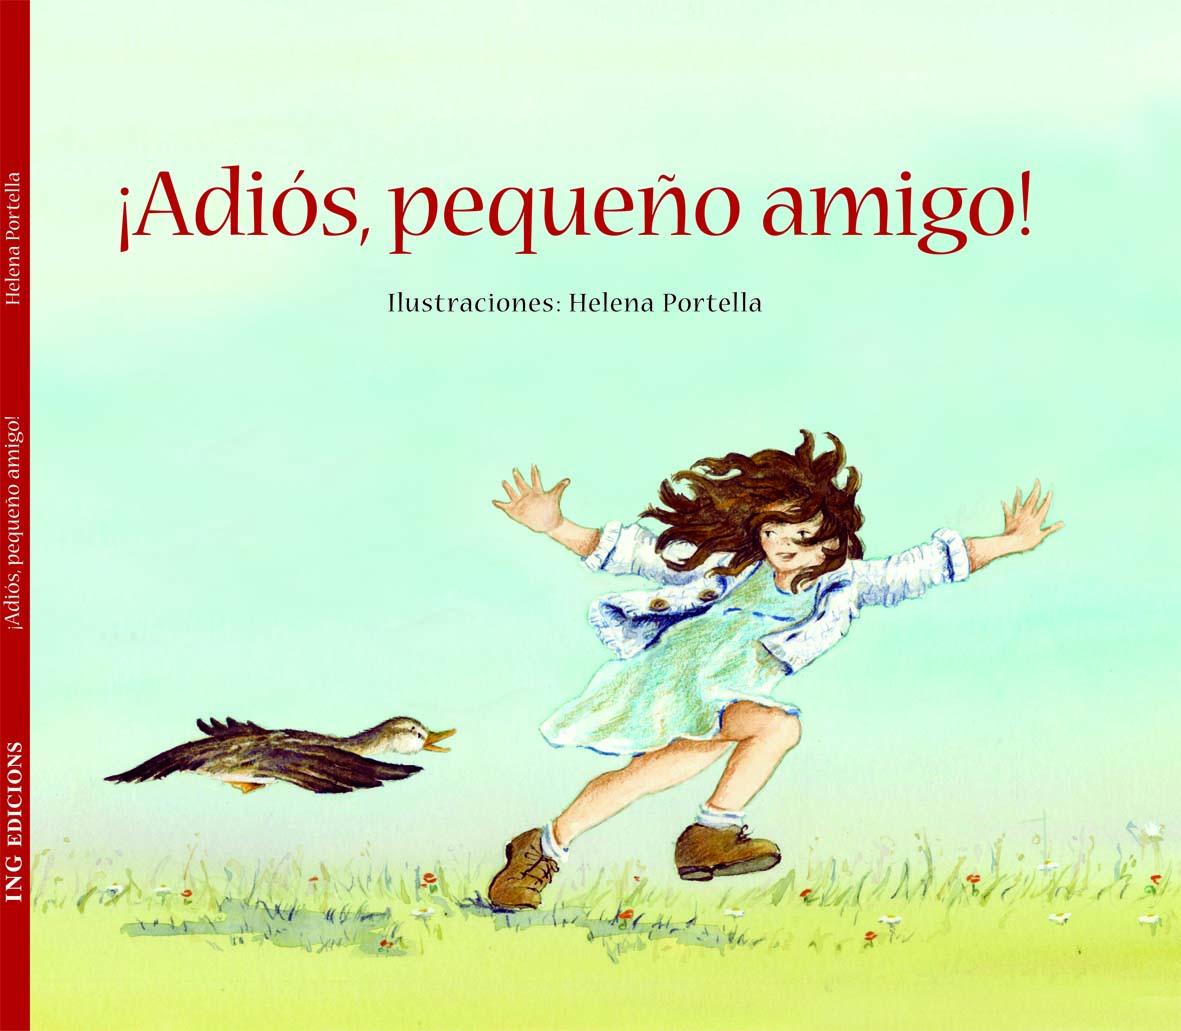 adios-pequeno-amigo-libros-recomendado-para-ninos-a-partir-de-3-anos